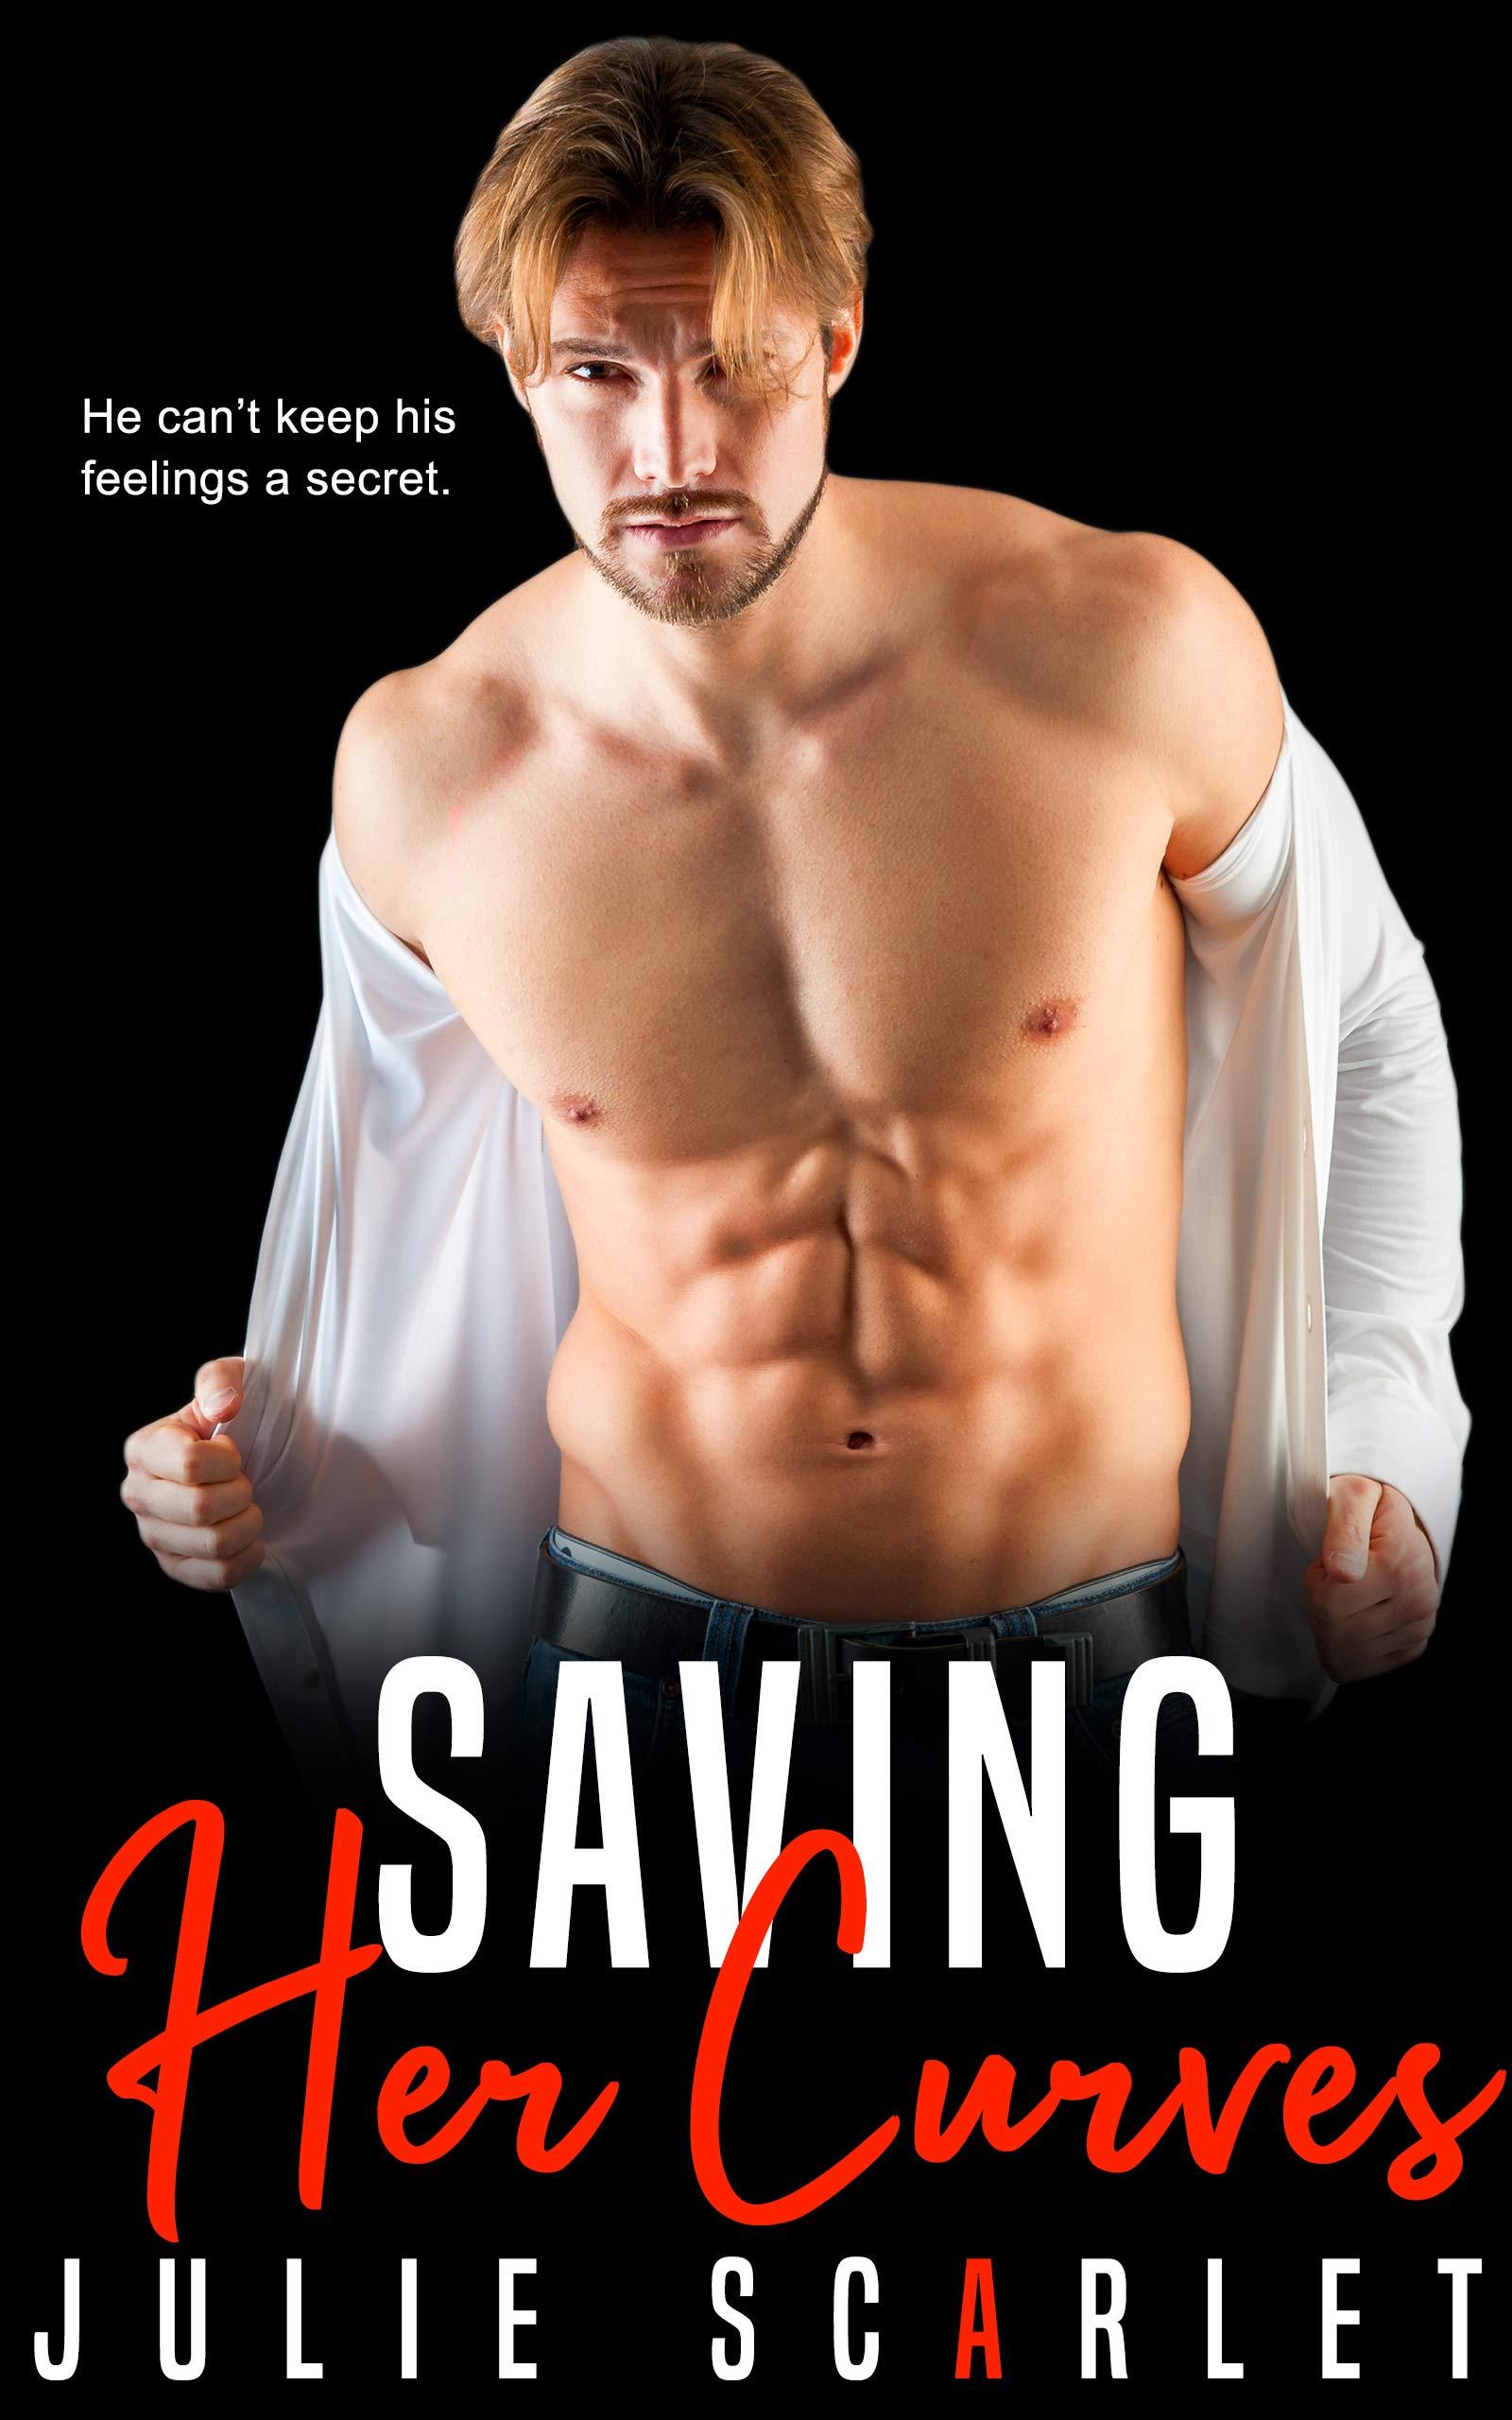 Saving Her Curves (Real Men Love Big Curves #7)